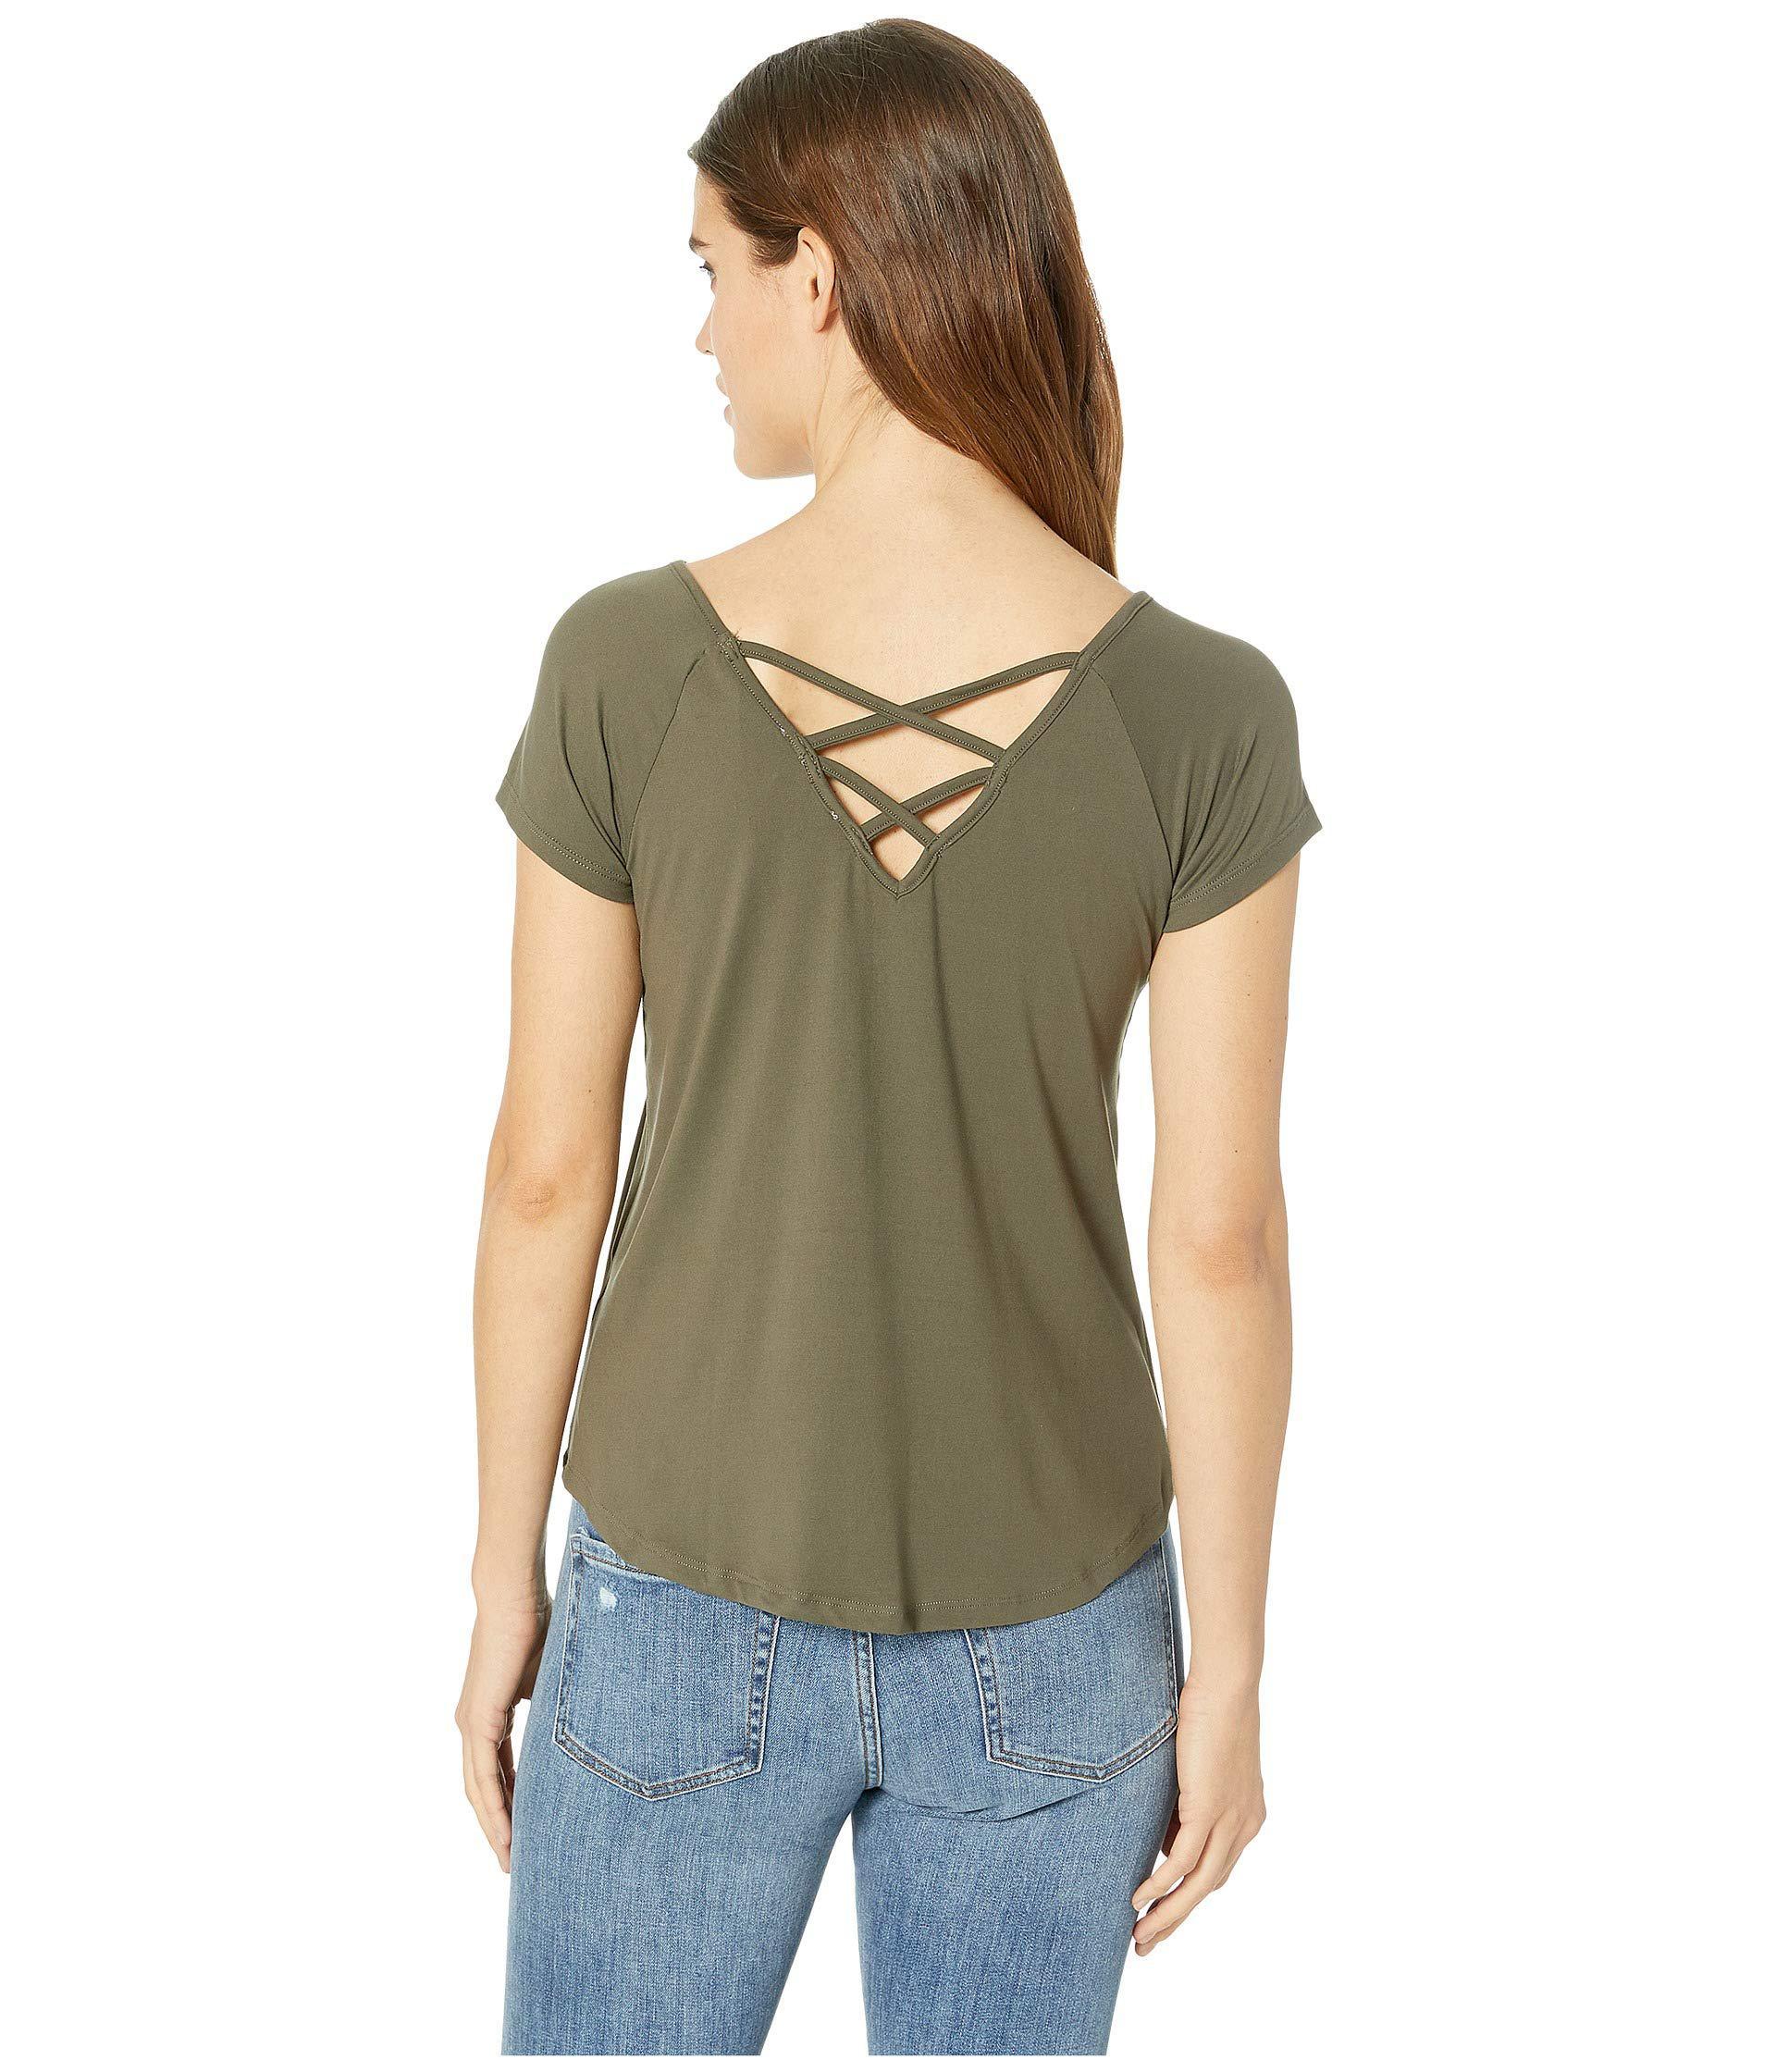 e10b4bcf4e8 Pink Rose - Green Raglan Short Sleeve Shirttail Top W  Back Double  Crisscross - Lyst. View fullscreen